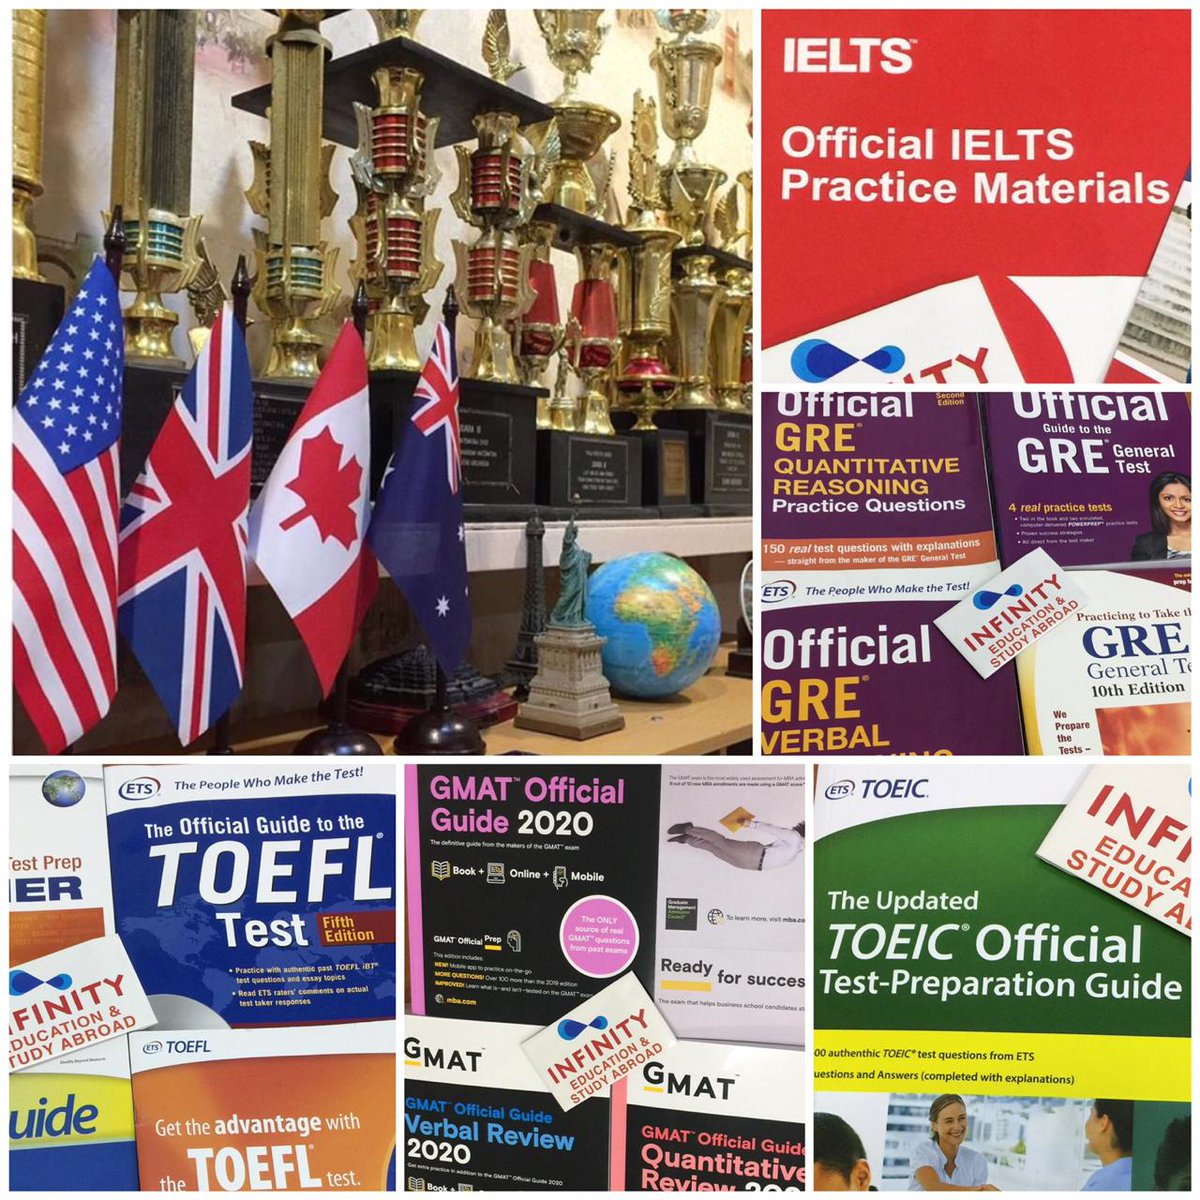 Pusat Persiapan Test #TOEFL #IELTS #GMAT #GRE #SAT #IGCSE #TOEIC • konsultasi Studi/Beasiswa ke Luar Negeri • (031)3816827 • PERTAMA & SATU-SATUNYA DI #SURABAYA https://t.co/VIqKL0riLw